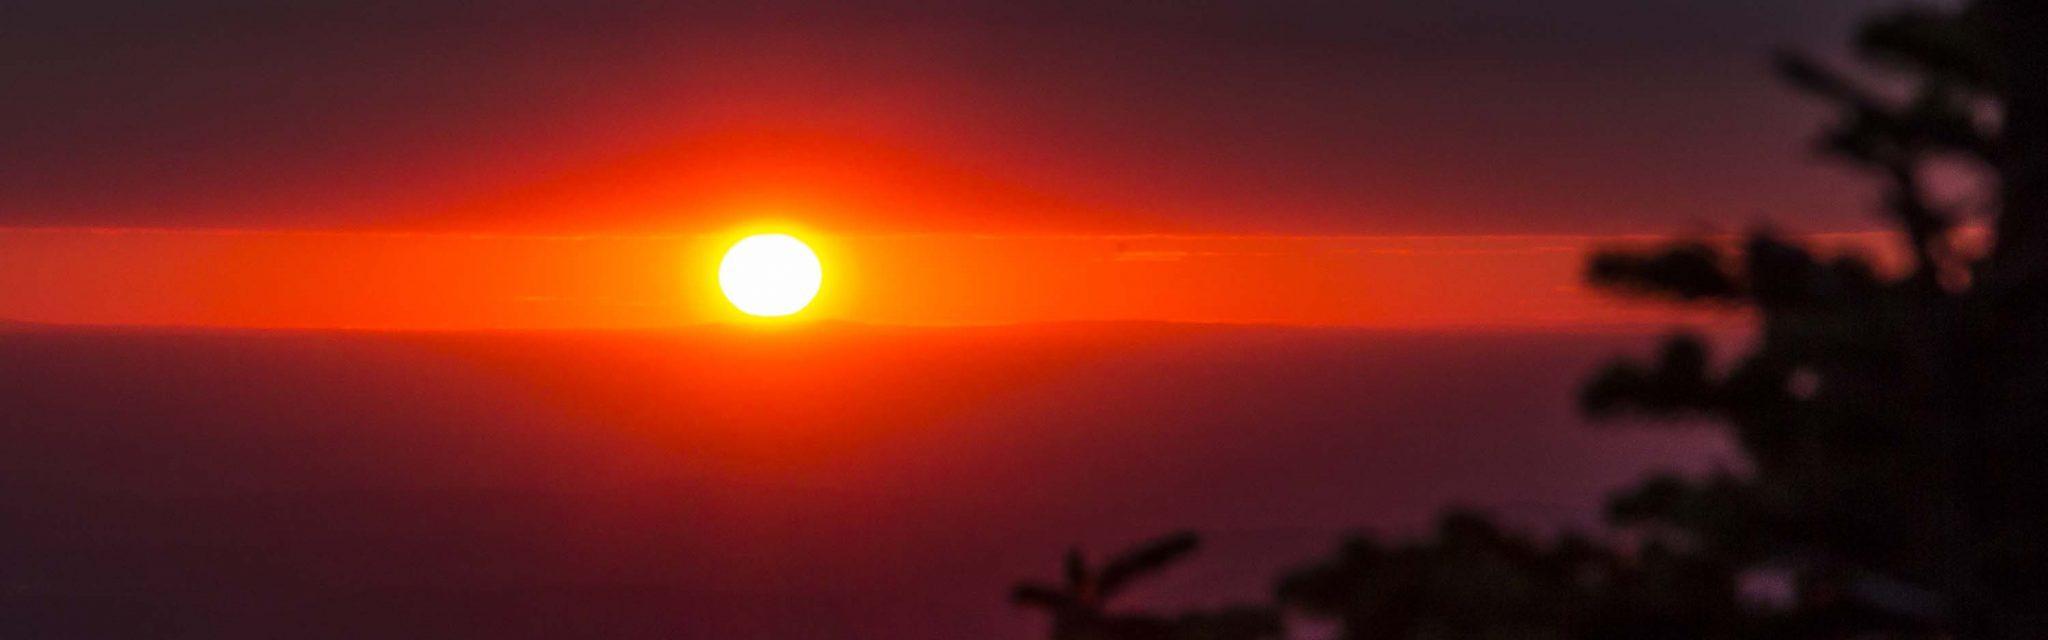 Sunset_Red_Ball_1